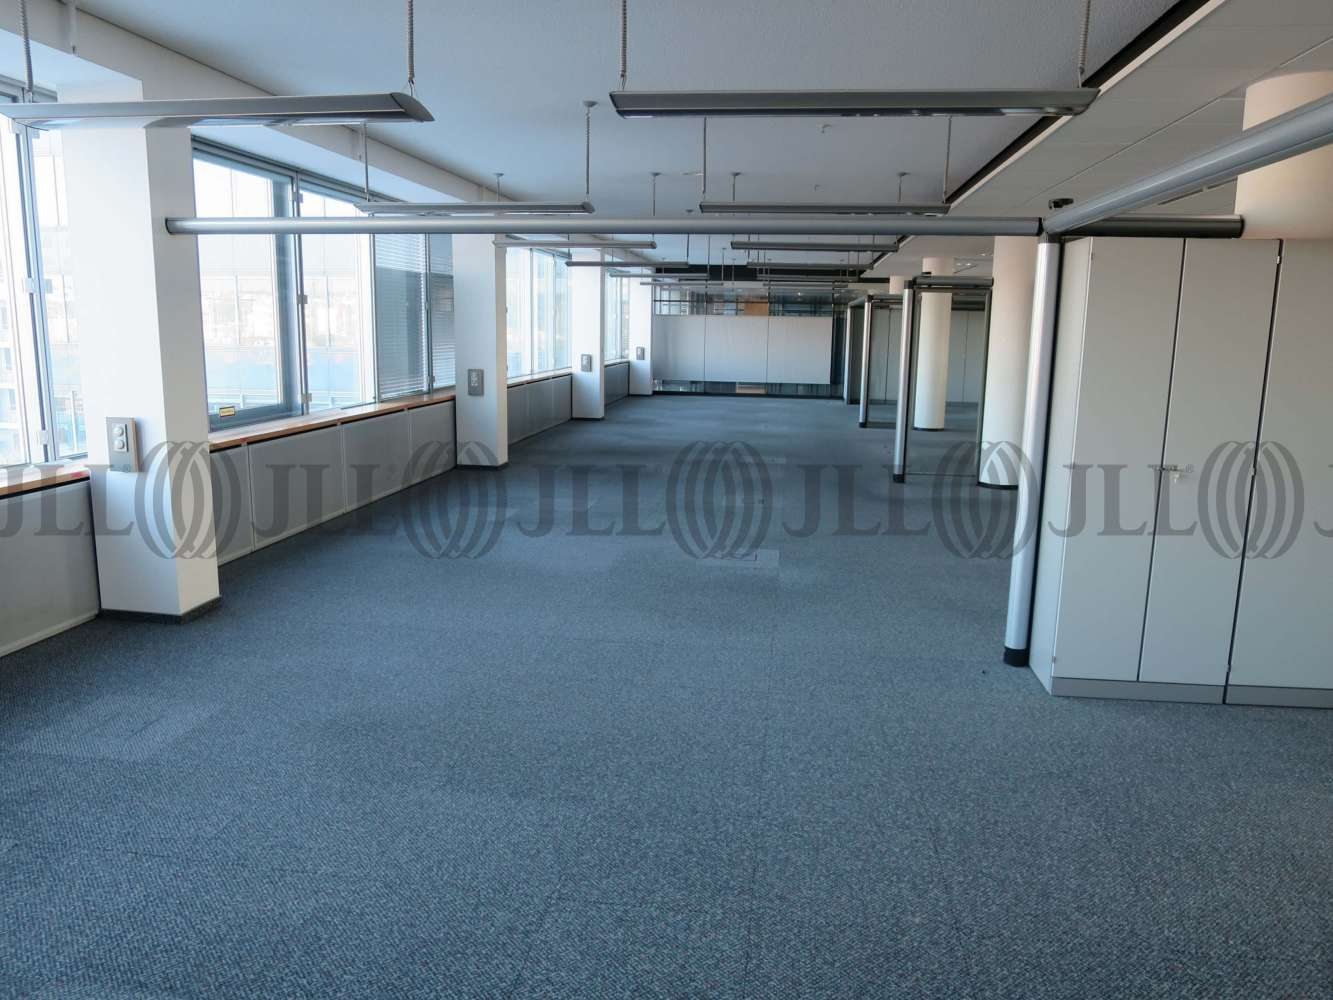 Büros Frankfurt am main, 60386 - Büro - Frankfurt am Main, Fechenheim - F2401 - 9534741